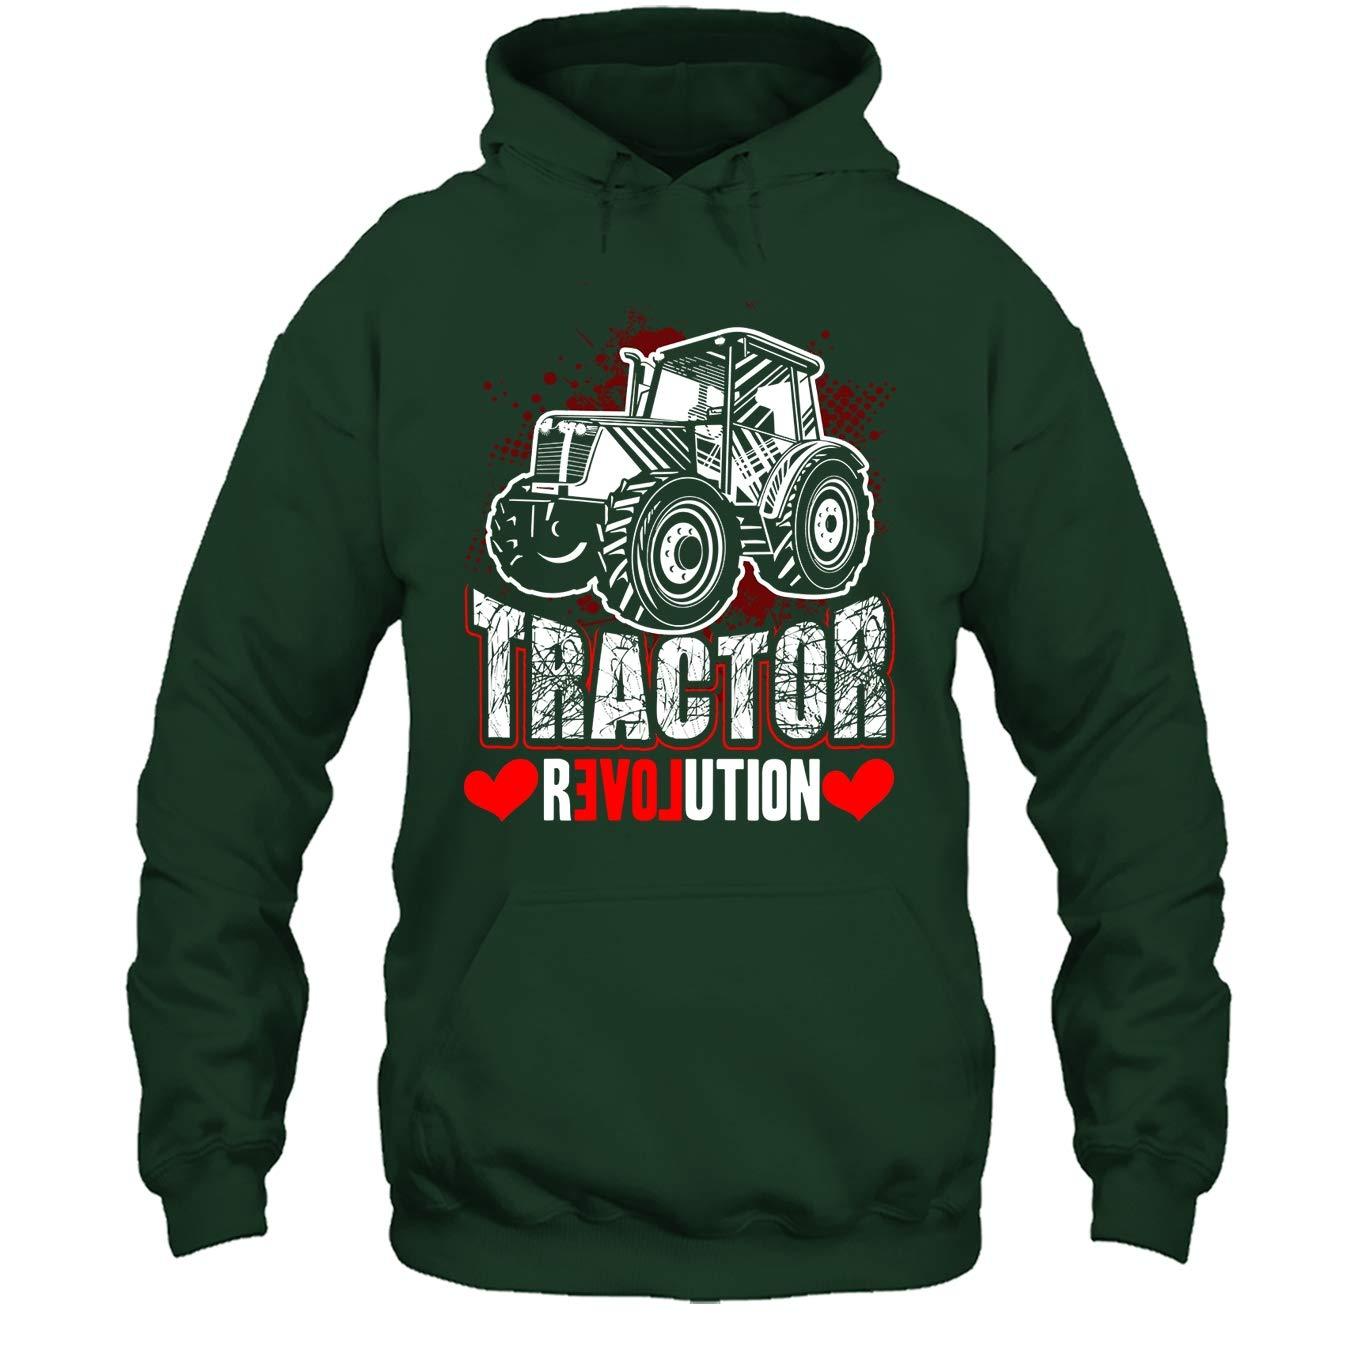 Seewhite Tractor Cool Tshirt Tractor Revolution T Shirt Design